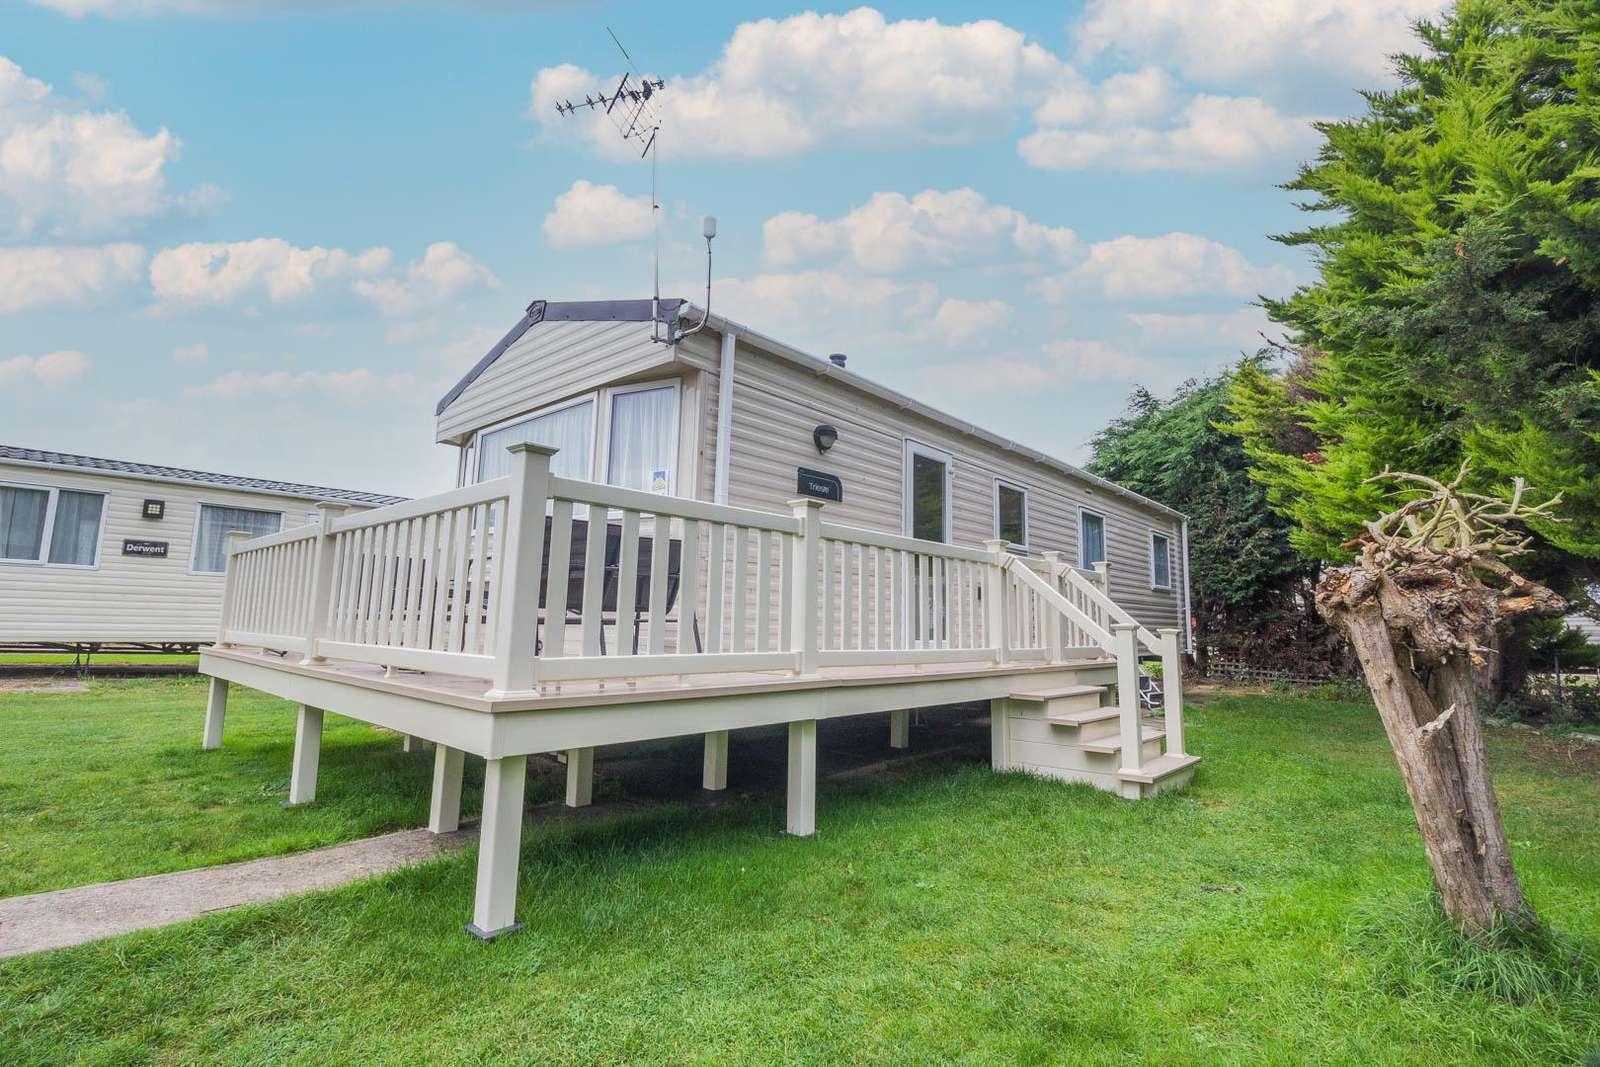 27028R – Seawick, 3 bed, 8 berth caravan with decking & free WiFi. Diamond rated. - property